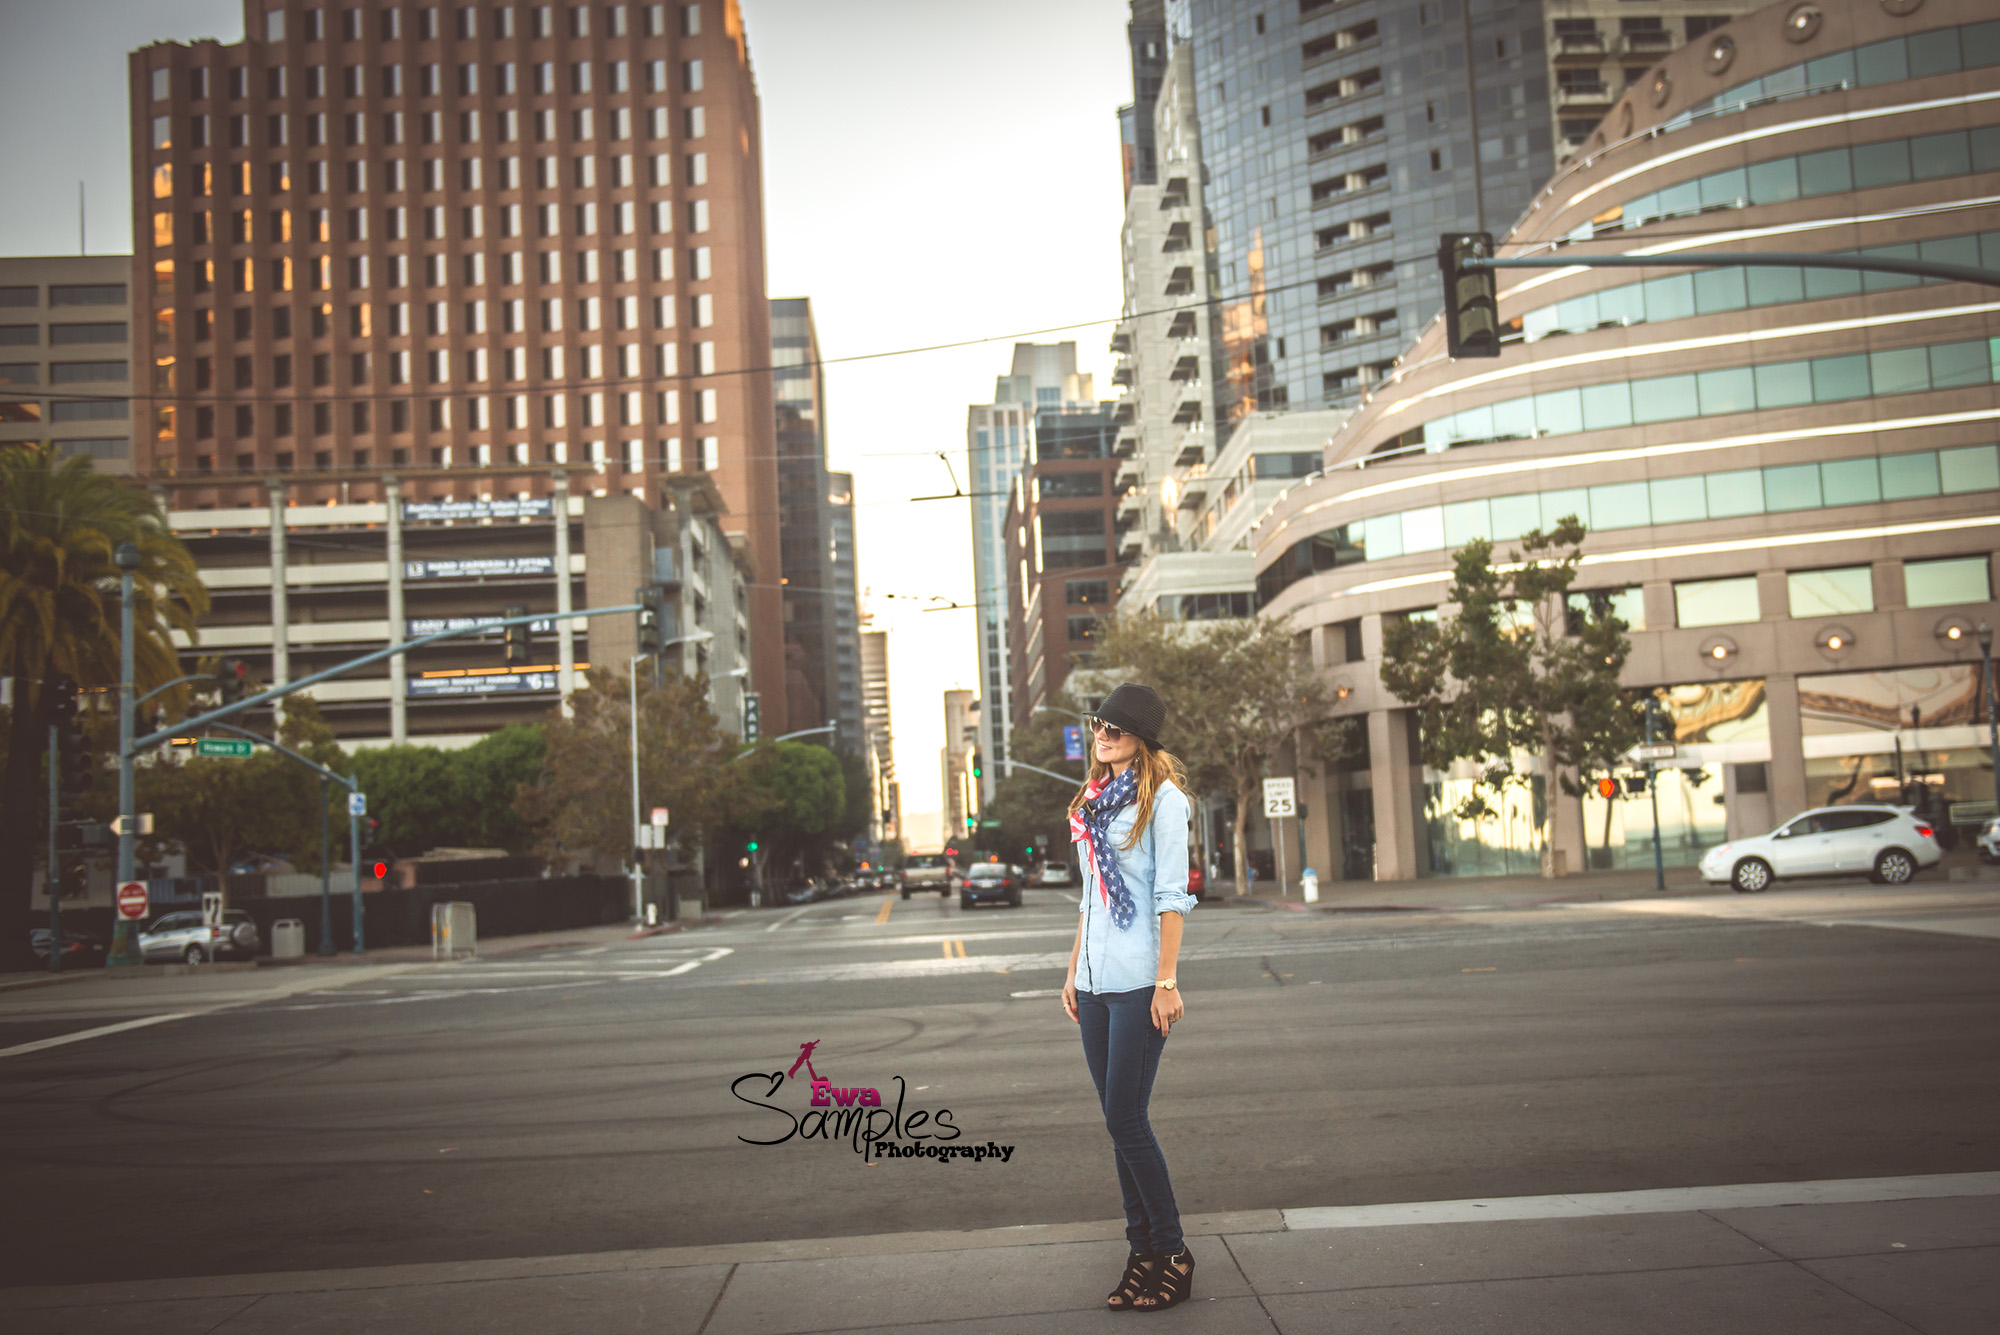 san_francisco_portrait_session_ewa_samples_photography 7